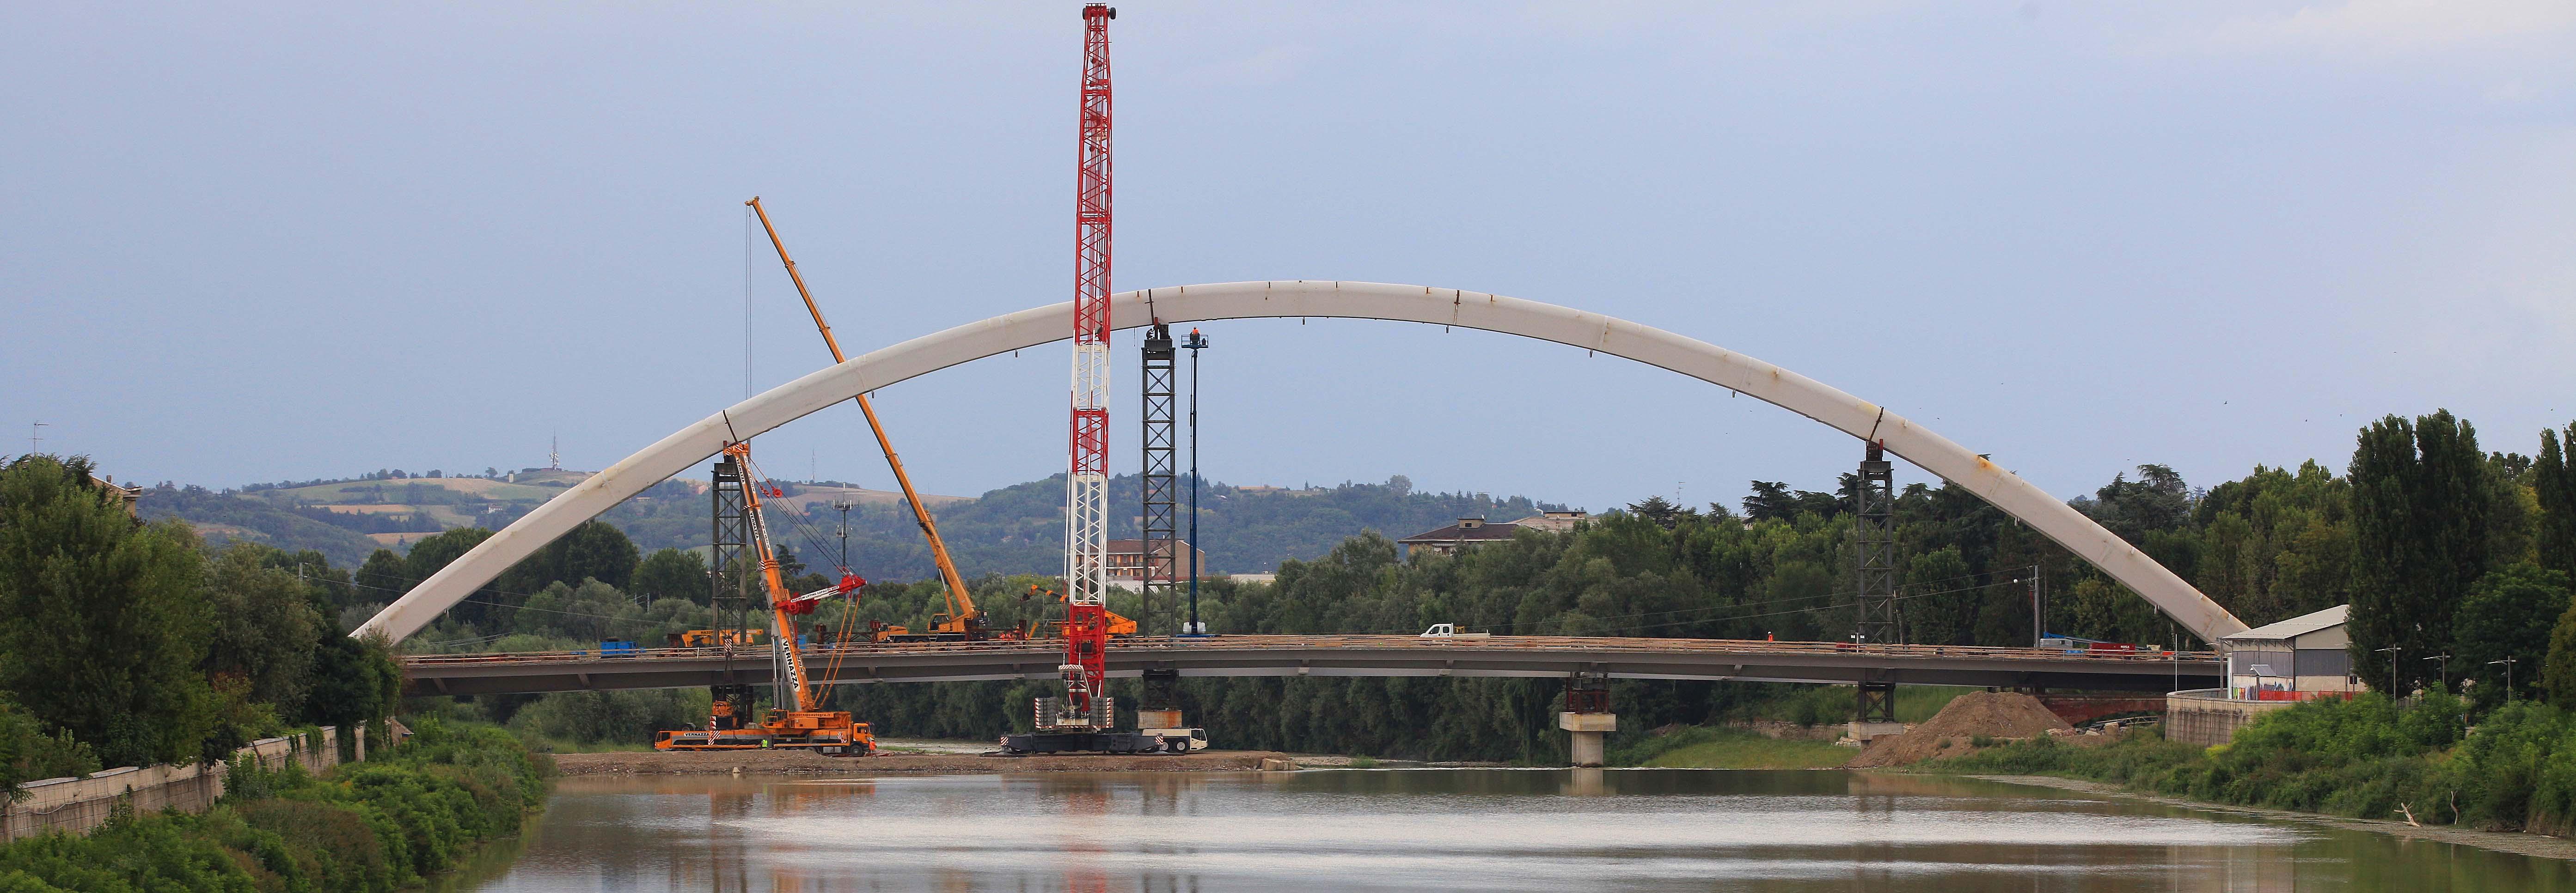 Alessandria, Ponte Meier (b. 63) Immagine Ponte Meier234.JPG da dimafoal host ALE2 @autore FEDCAS